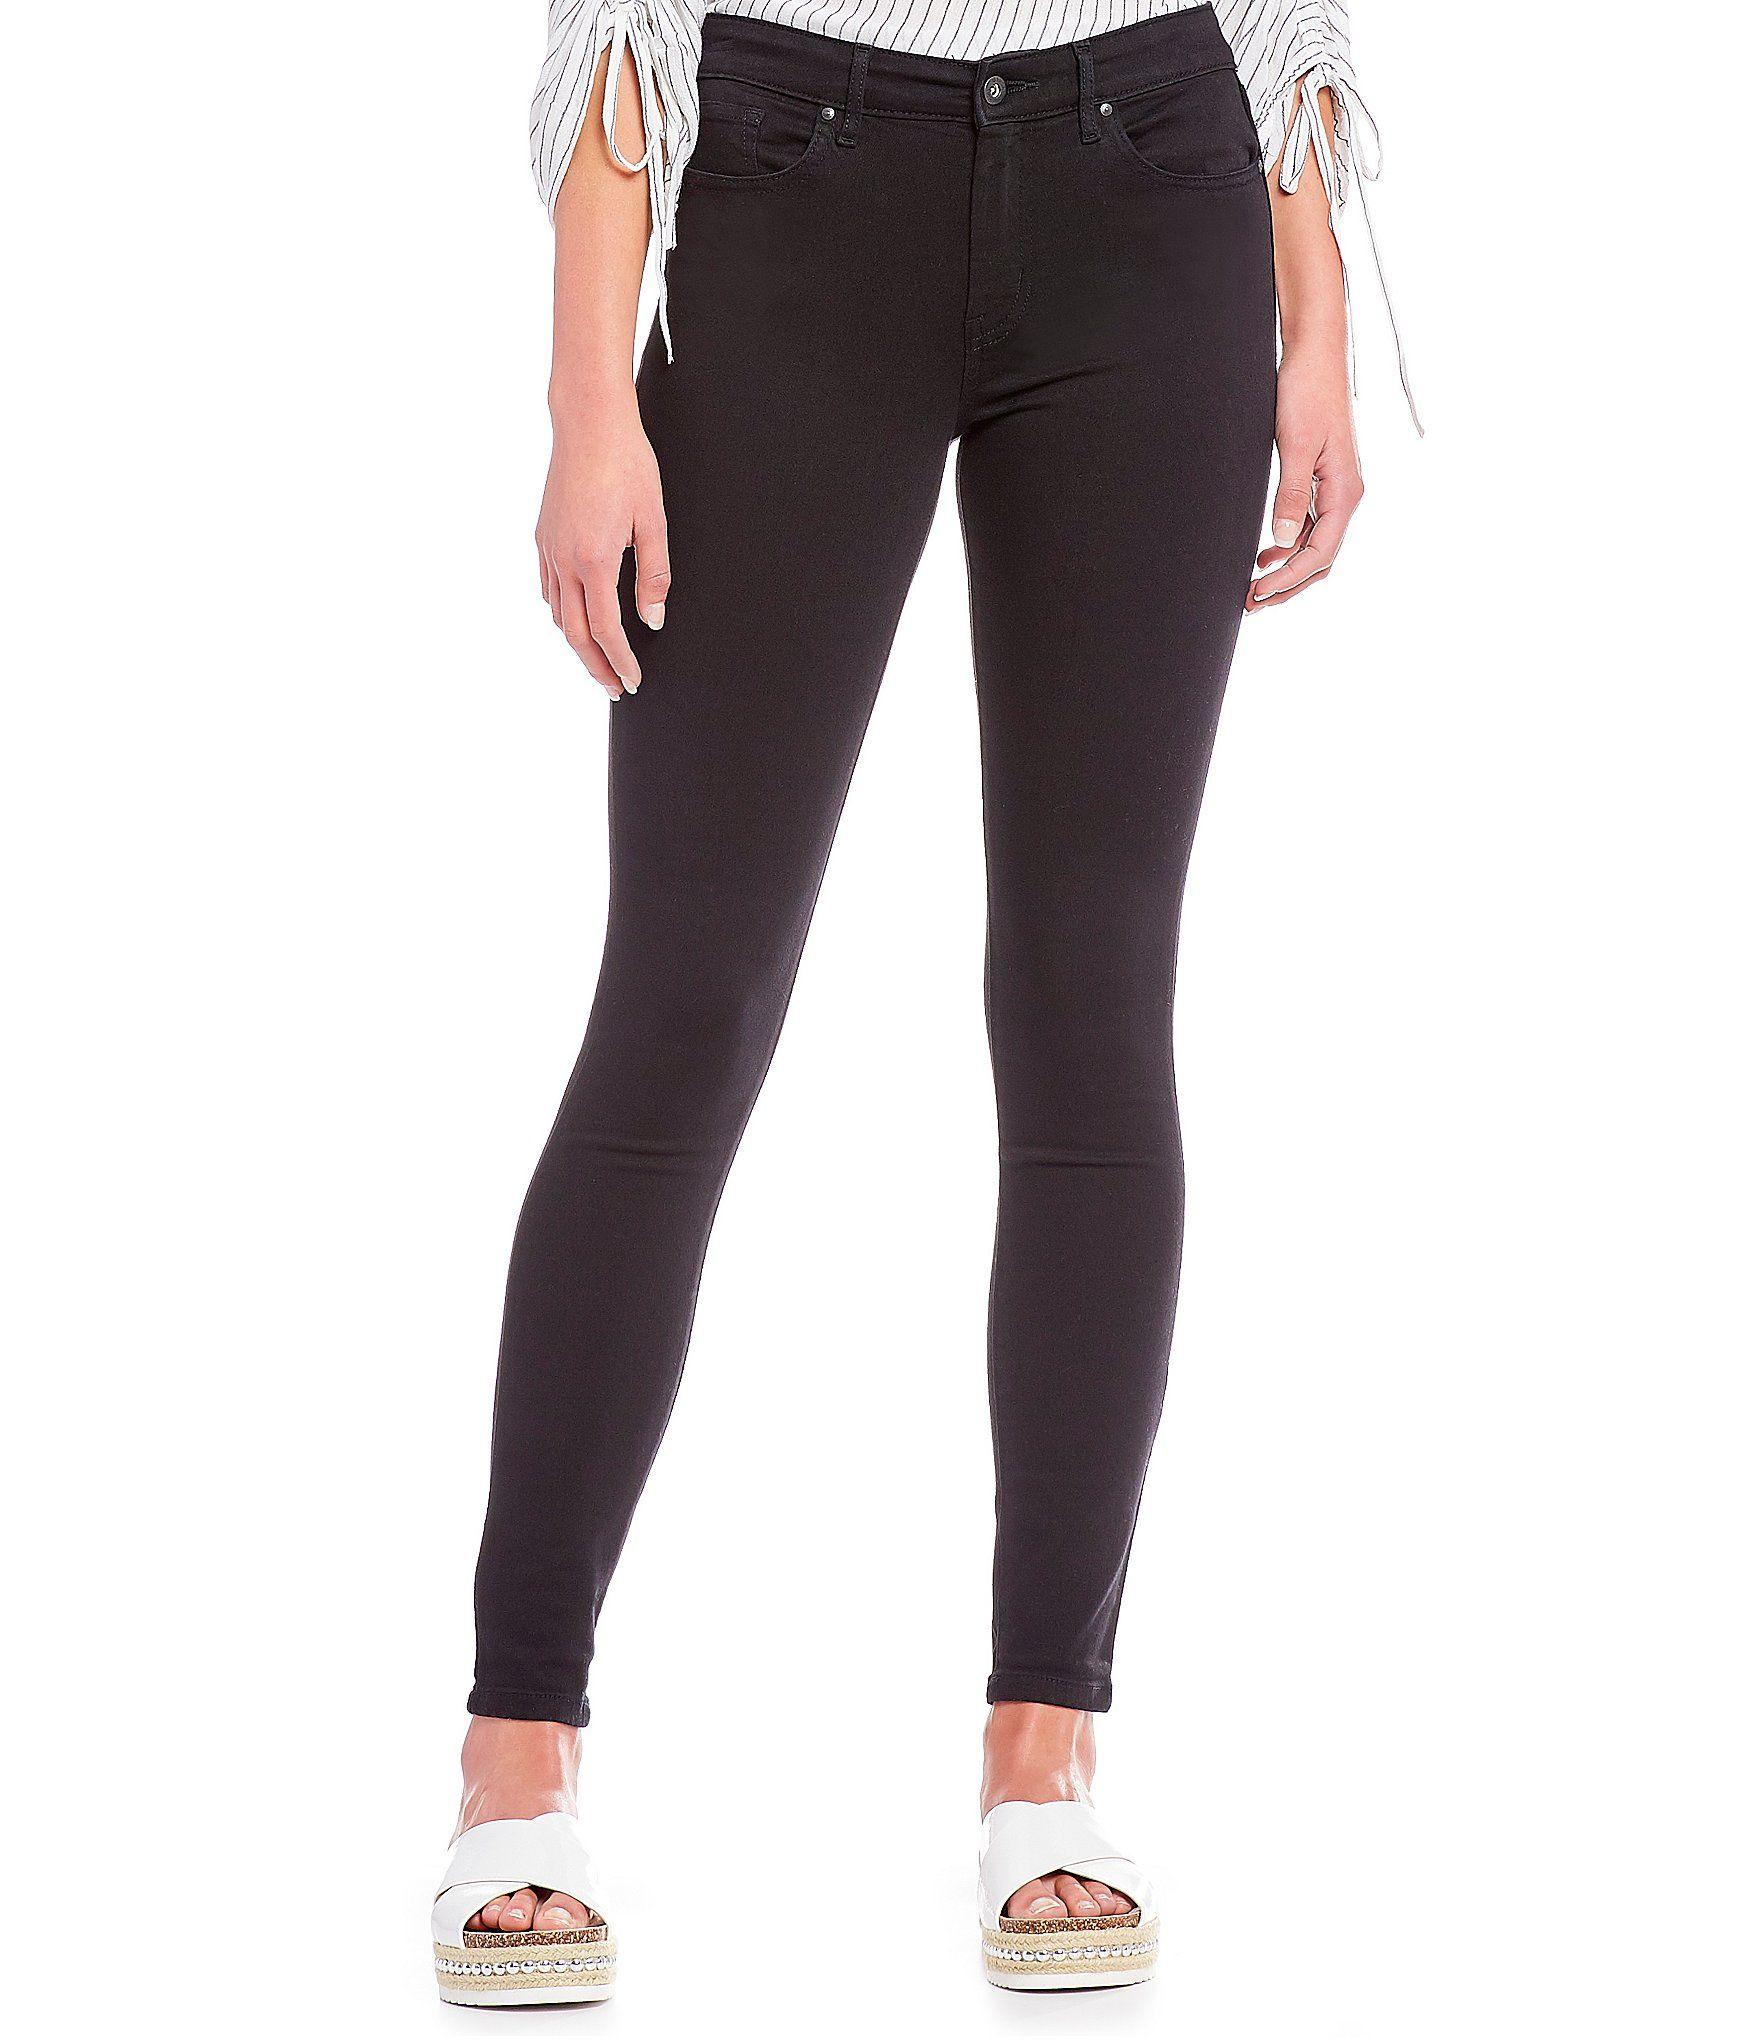 Dillards Wedding Gifts: Jessica Simpson Curvy High Rise Skinny Jeans